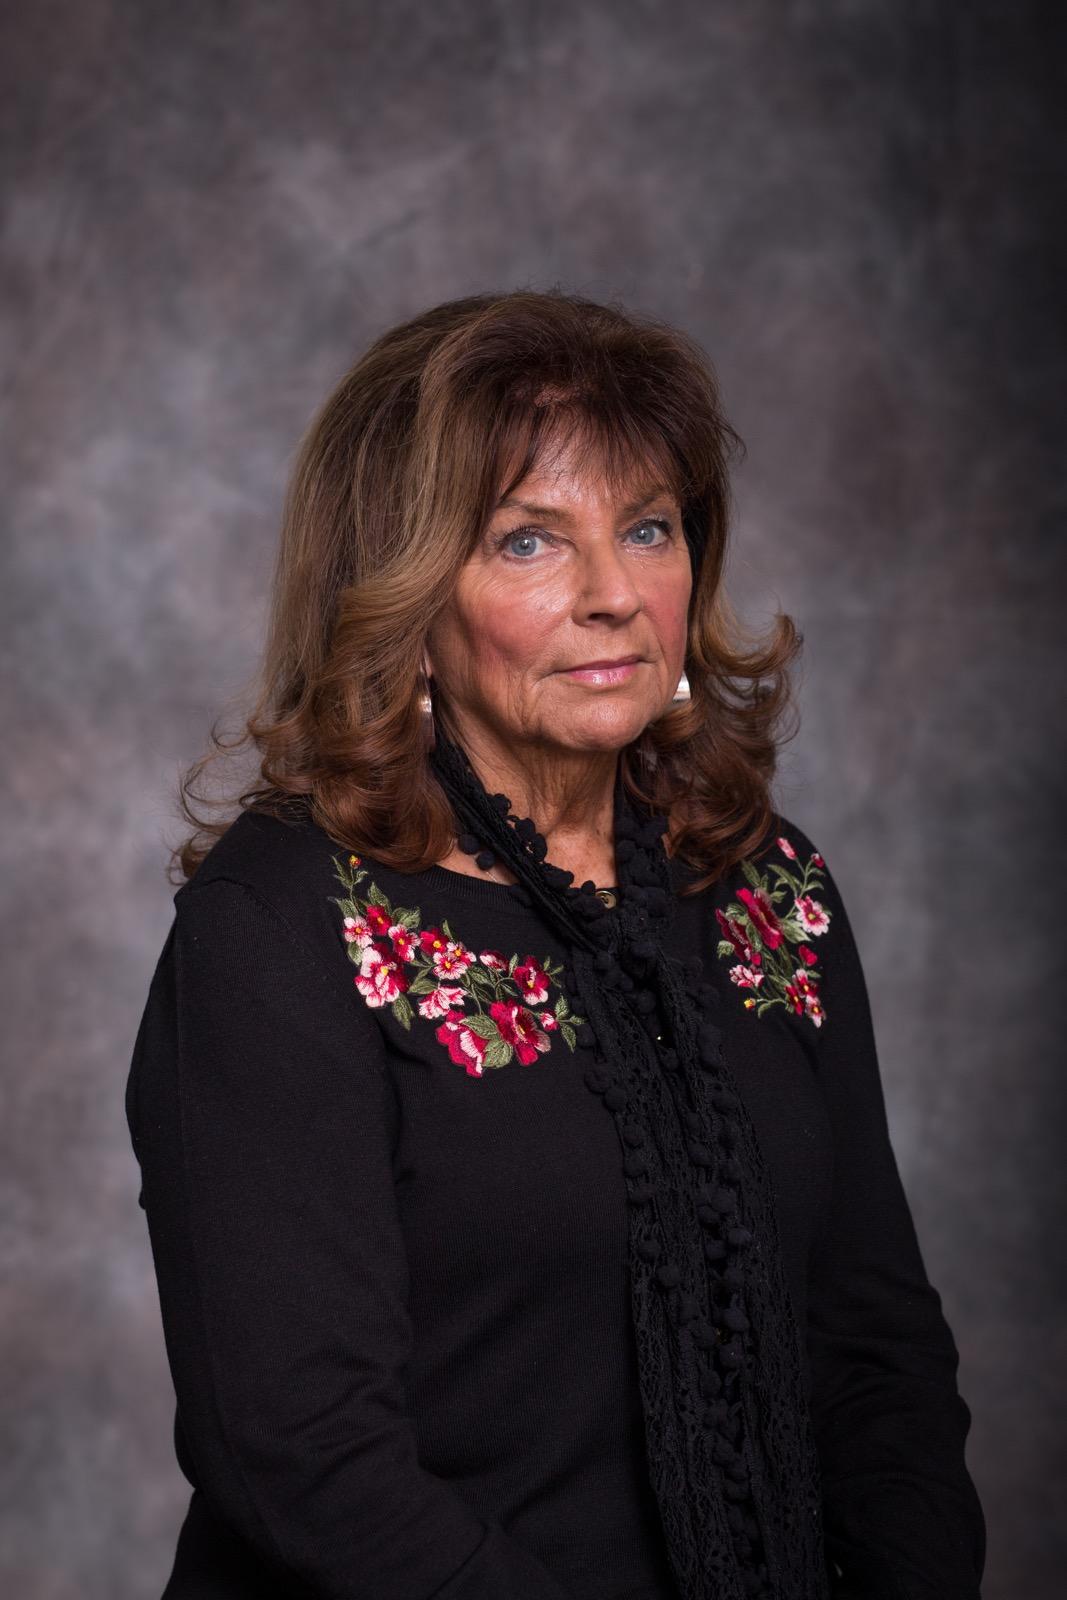 Judy Thole